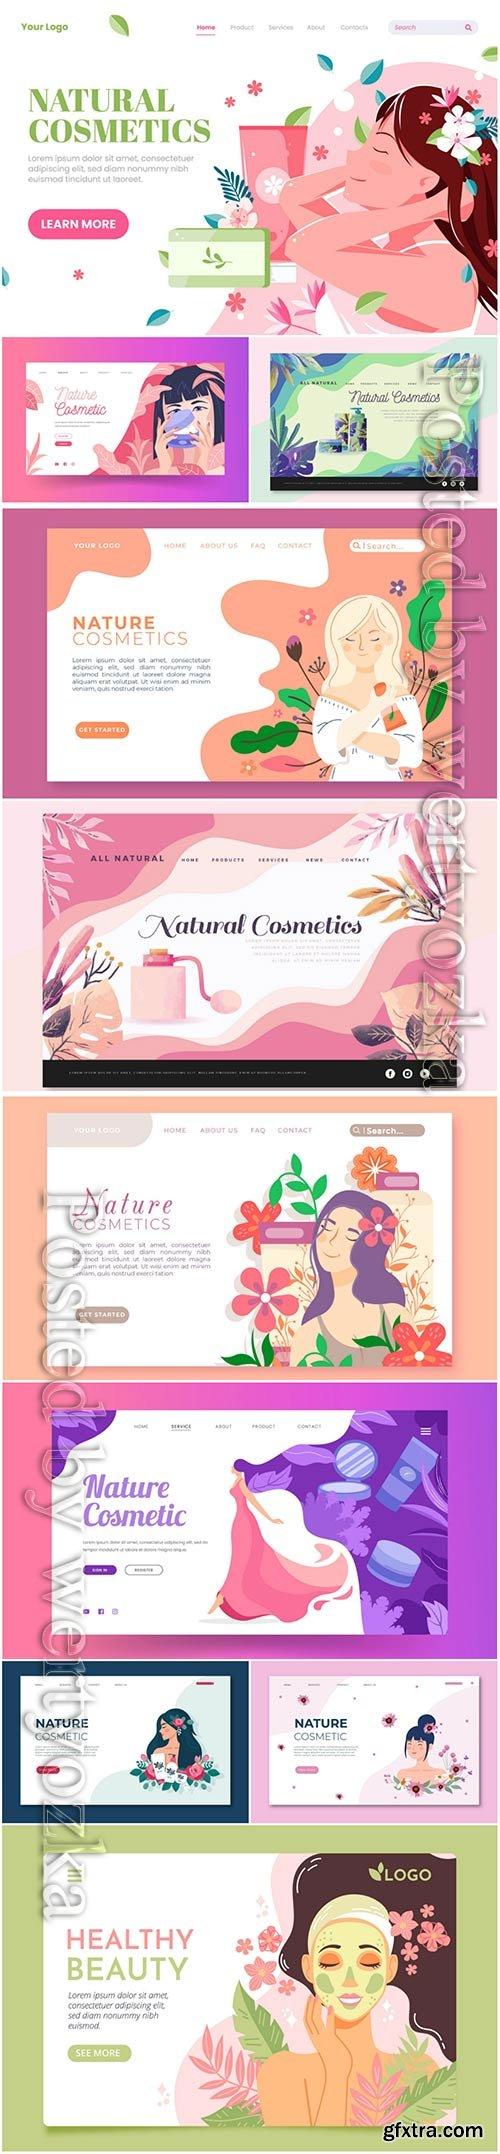 Nature cosmetics landing page